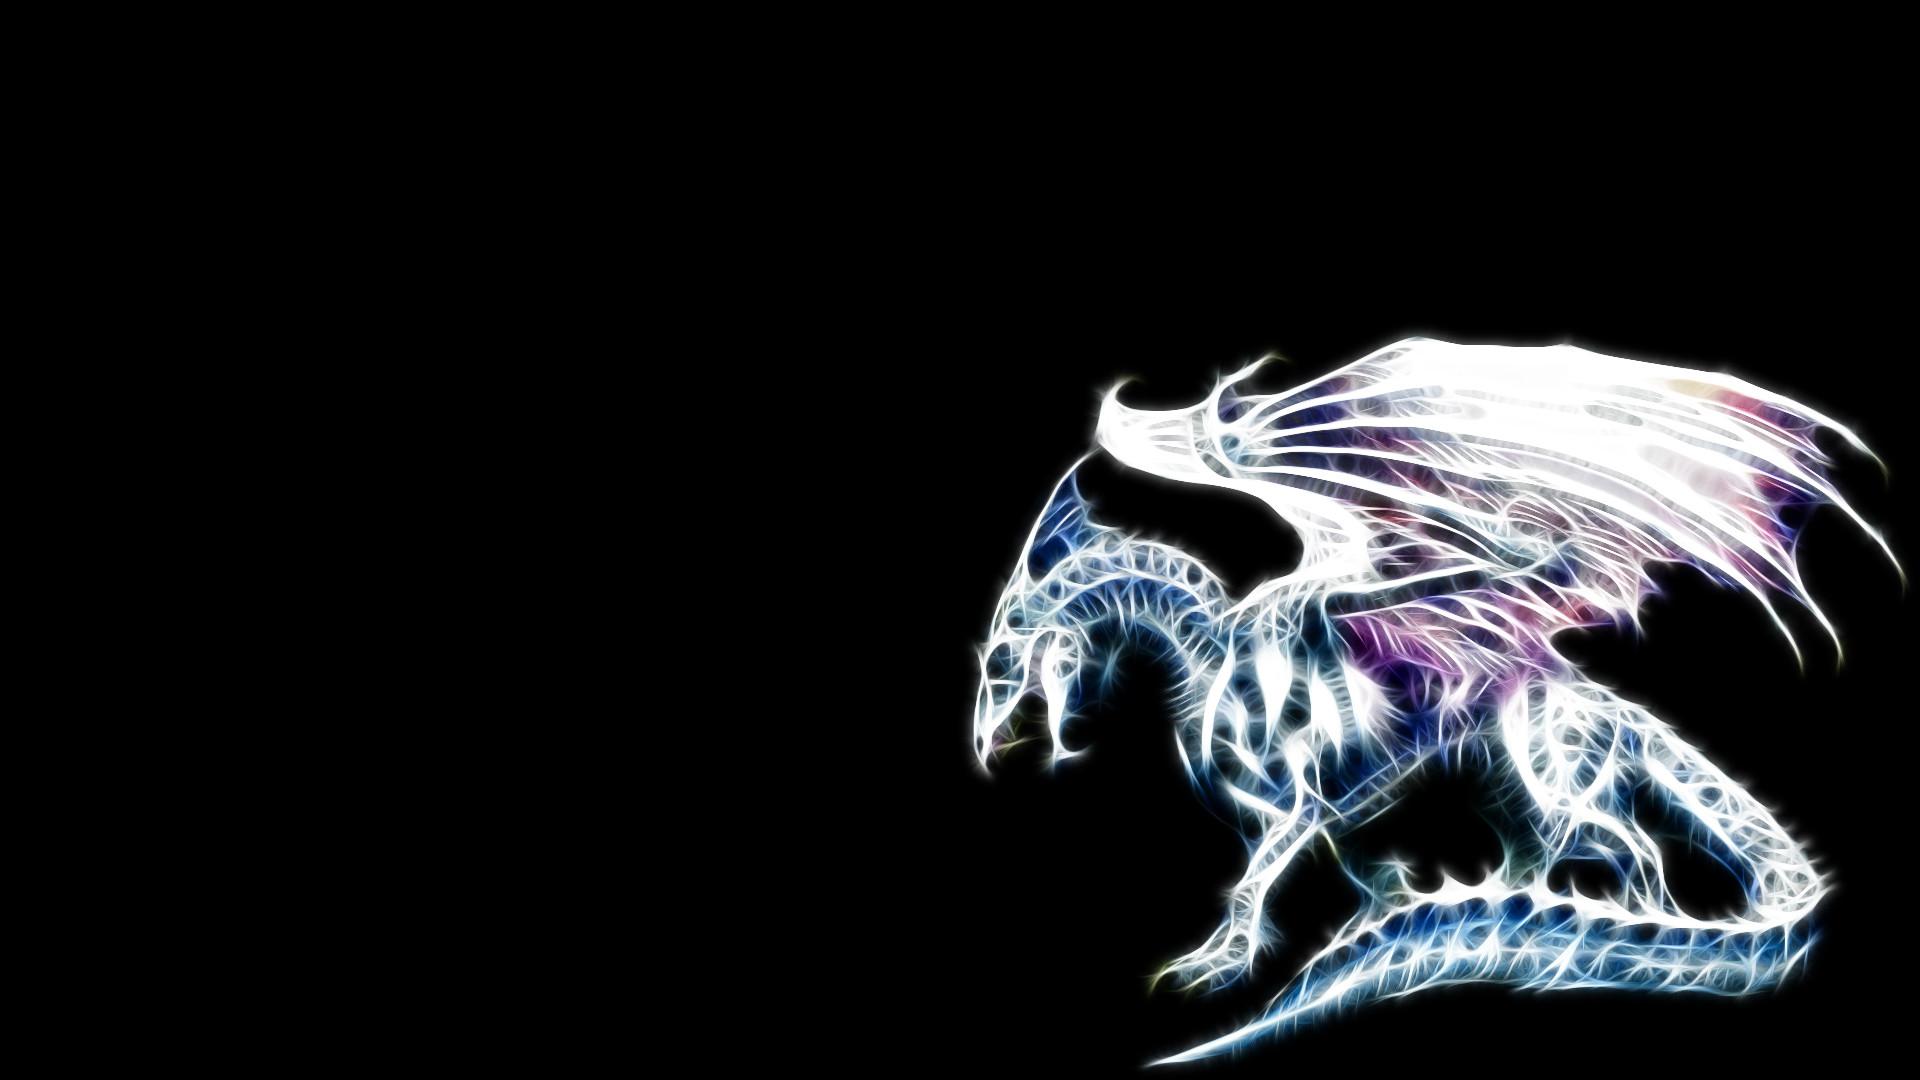 Dragon Background